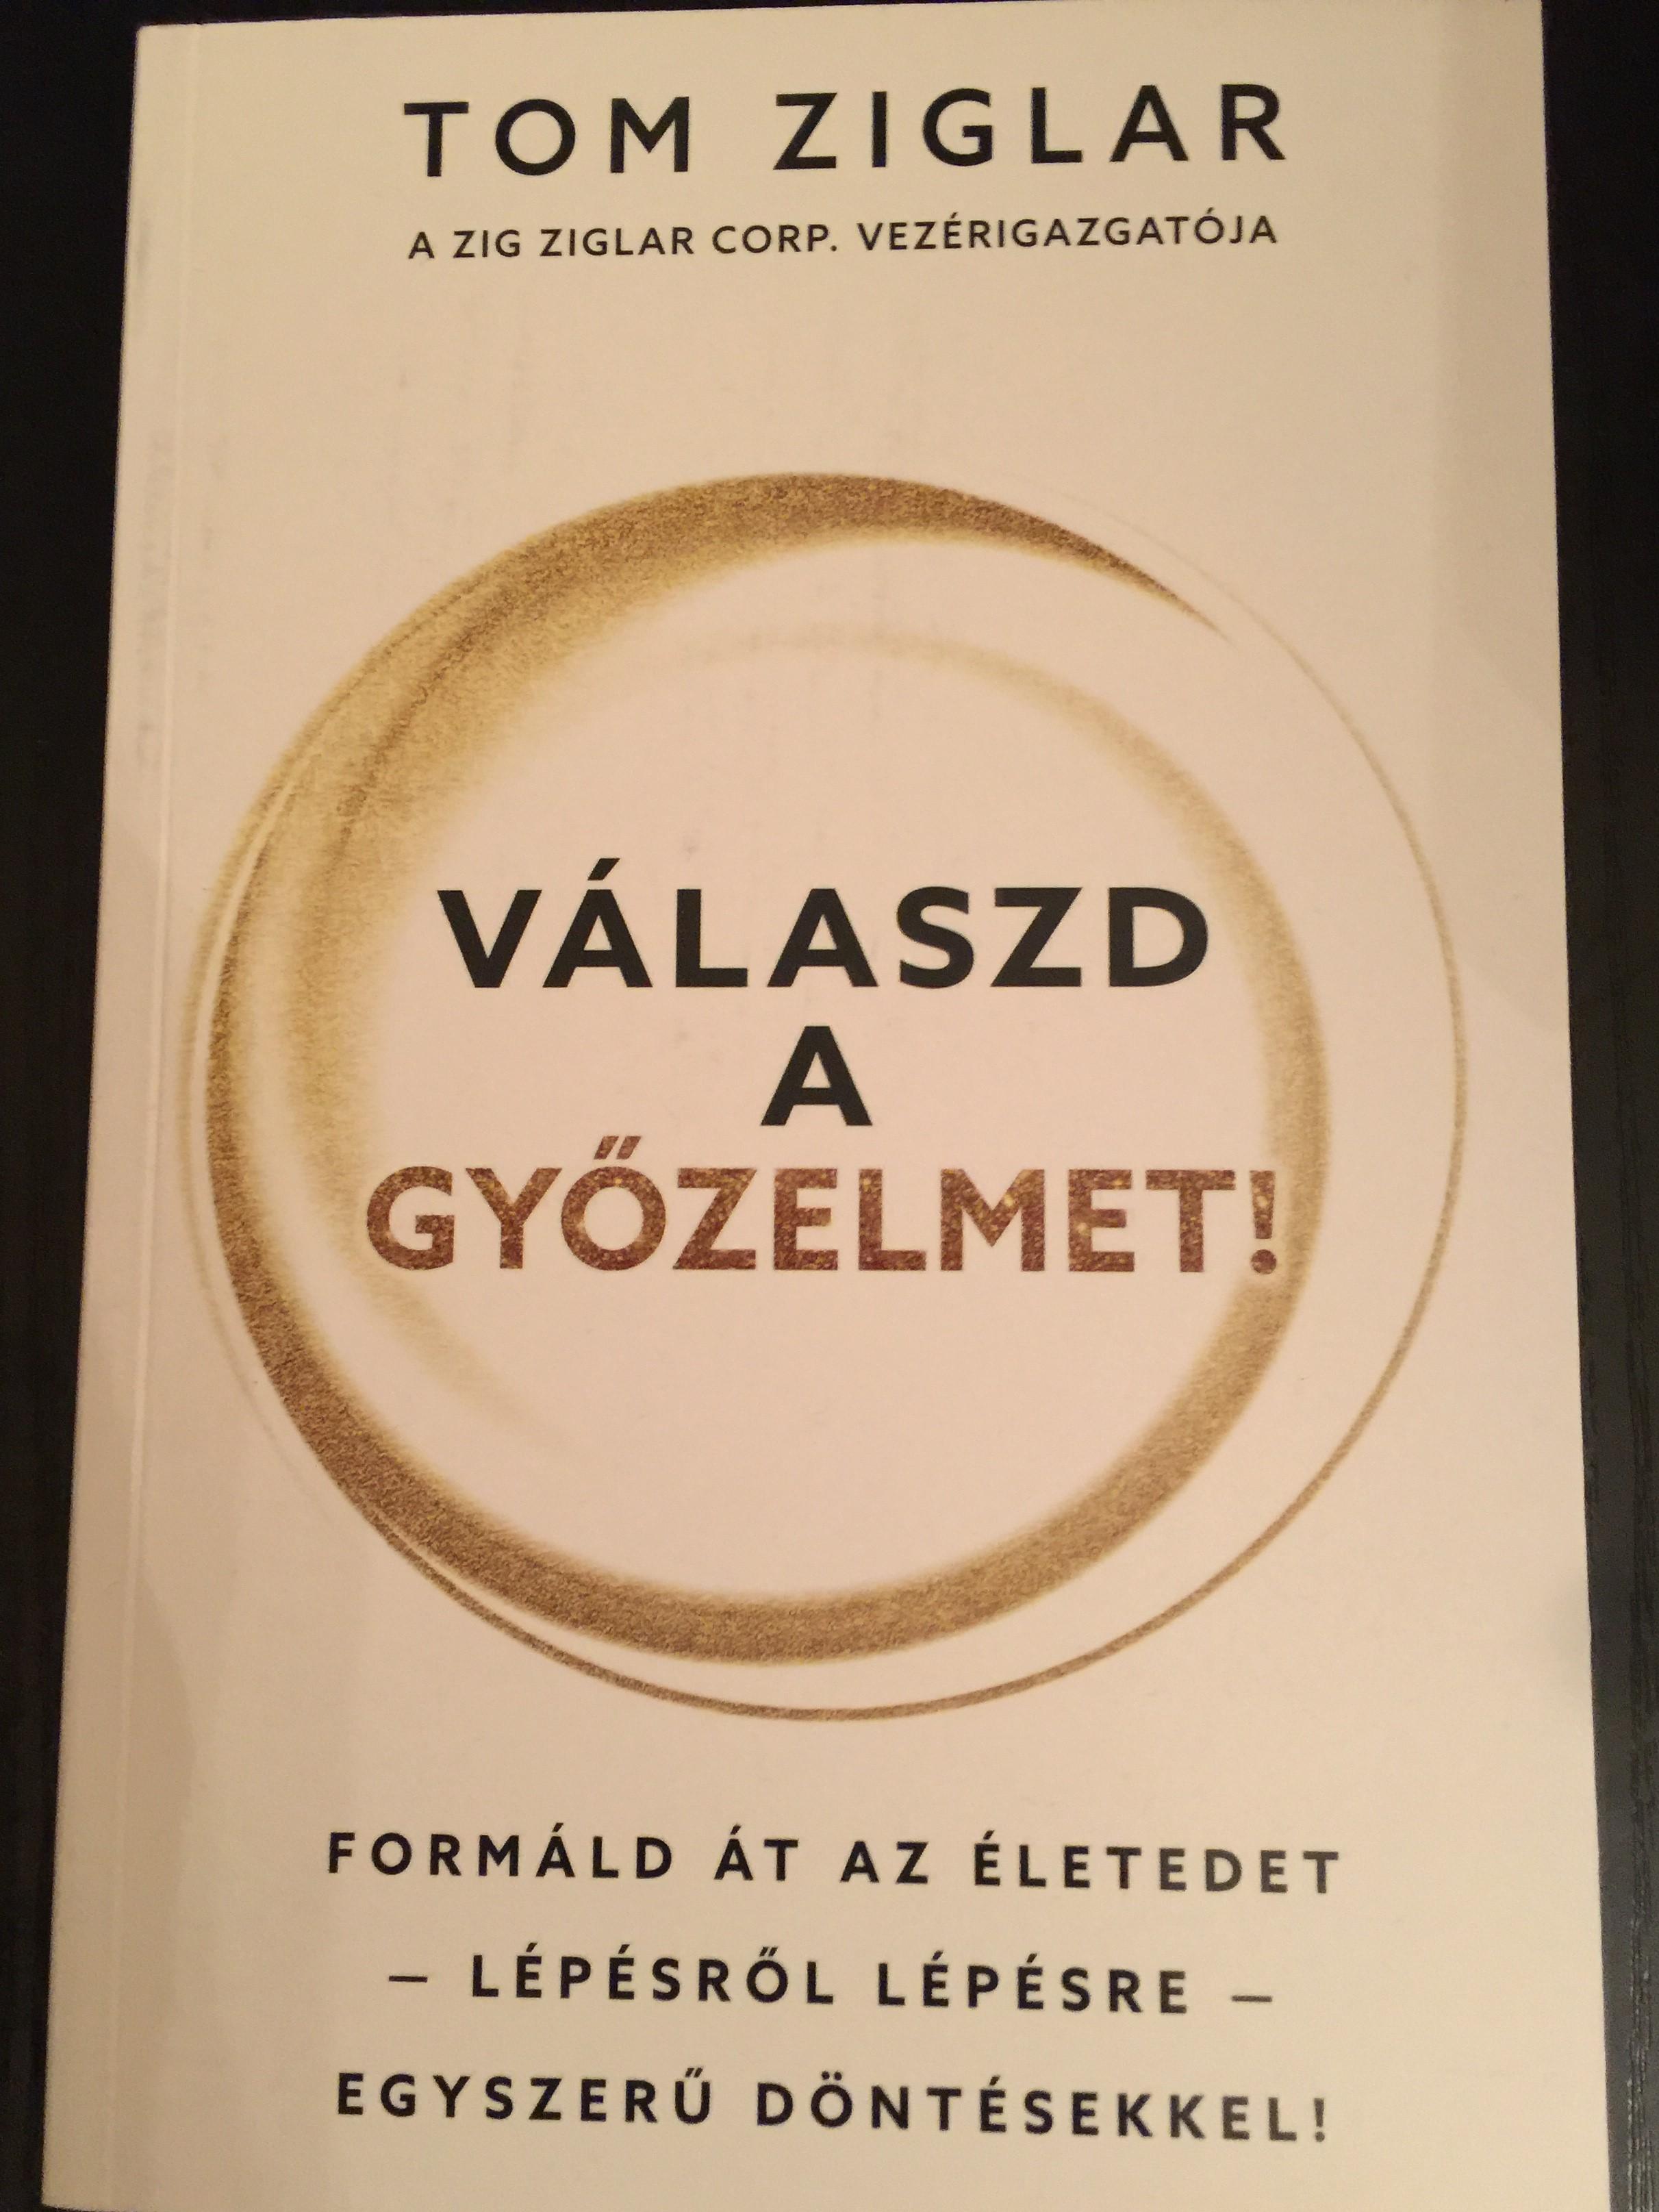 v-laszd-a-gy-zelmet-by-tom-ziglar-hungarian-edition-of-choose-to-win-1.jpg